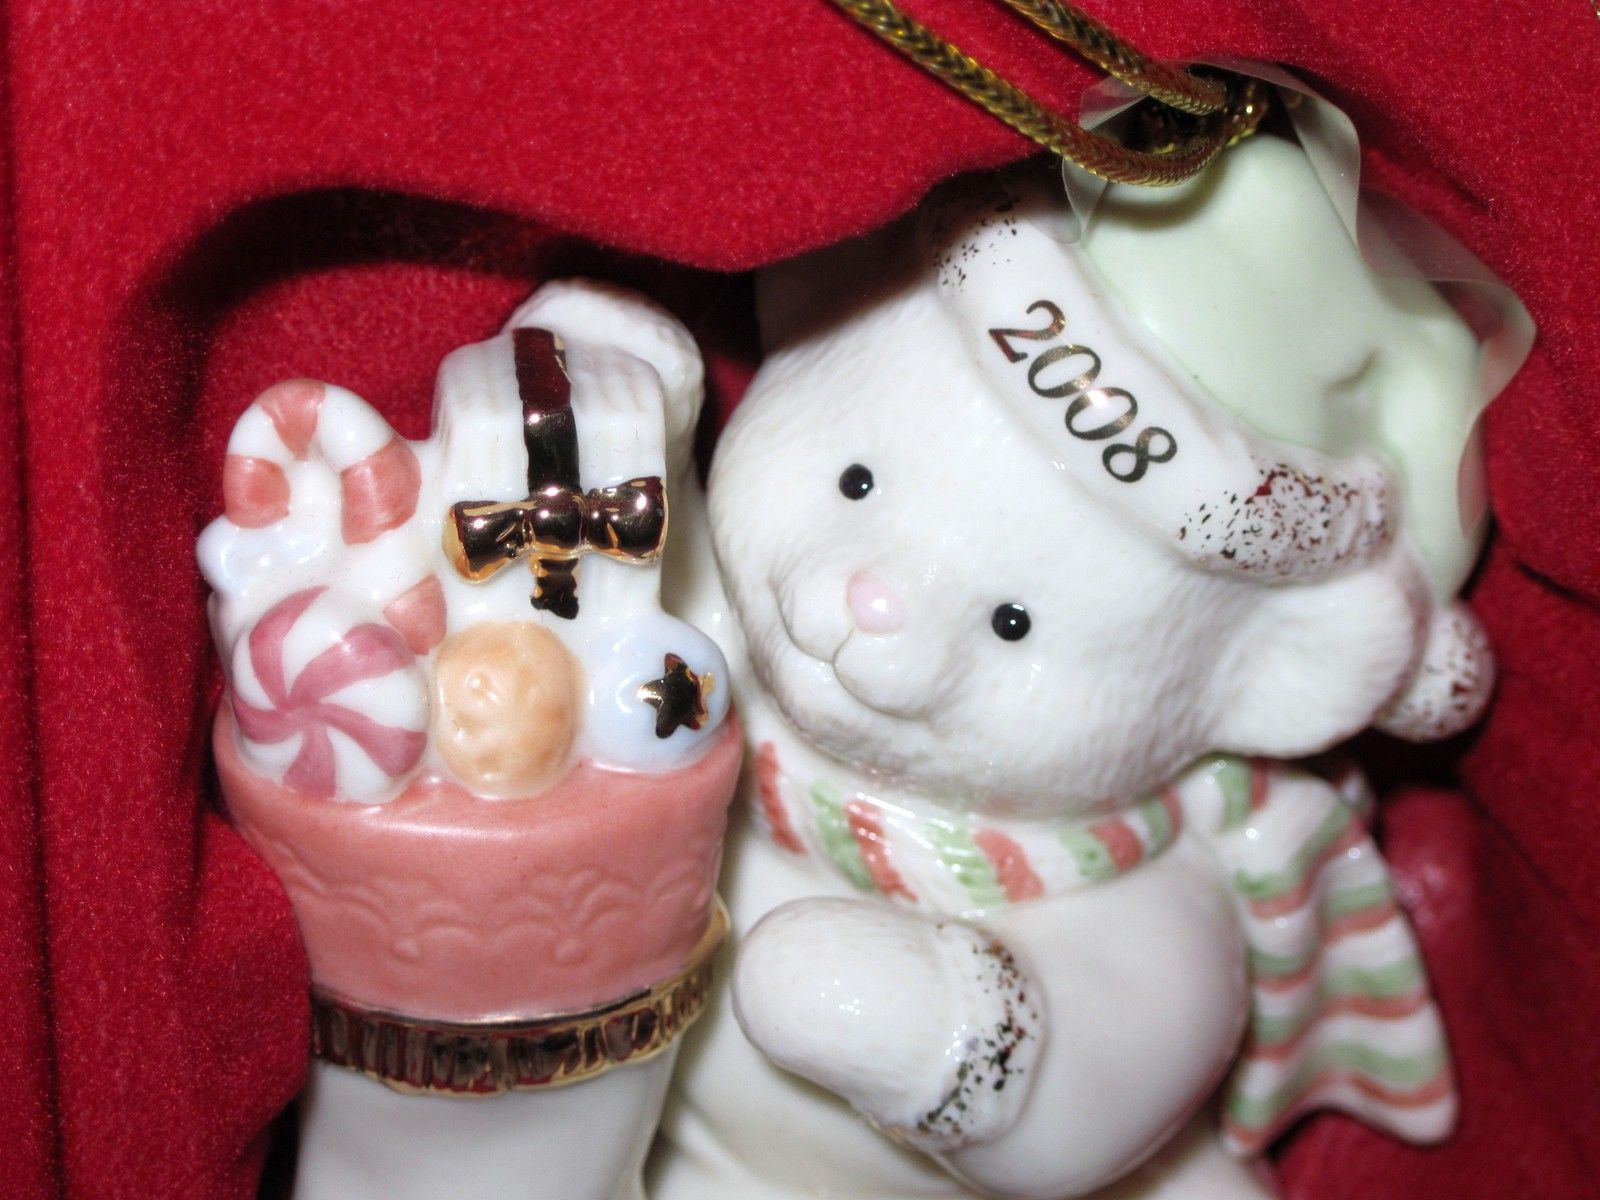 NIB Lenox 2008 Annual Teddy's Special Stocking  Christmas Ornament Bear fine chi image 2